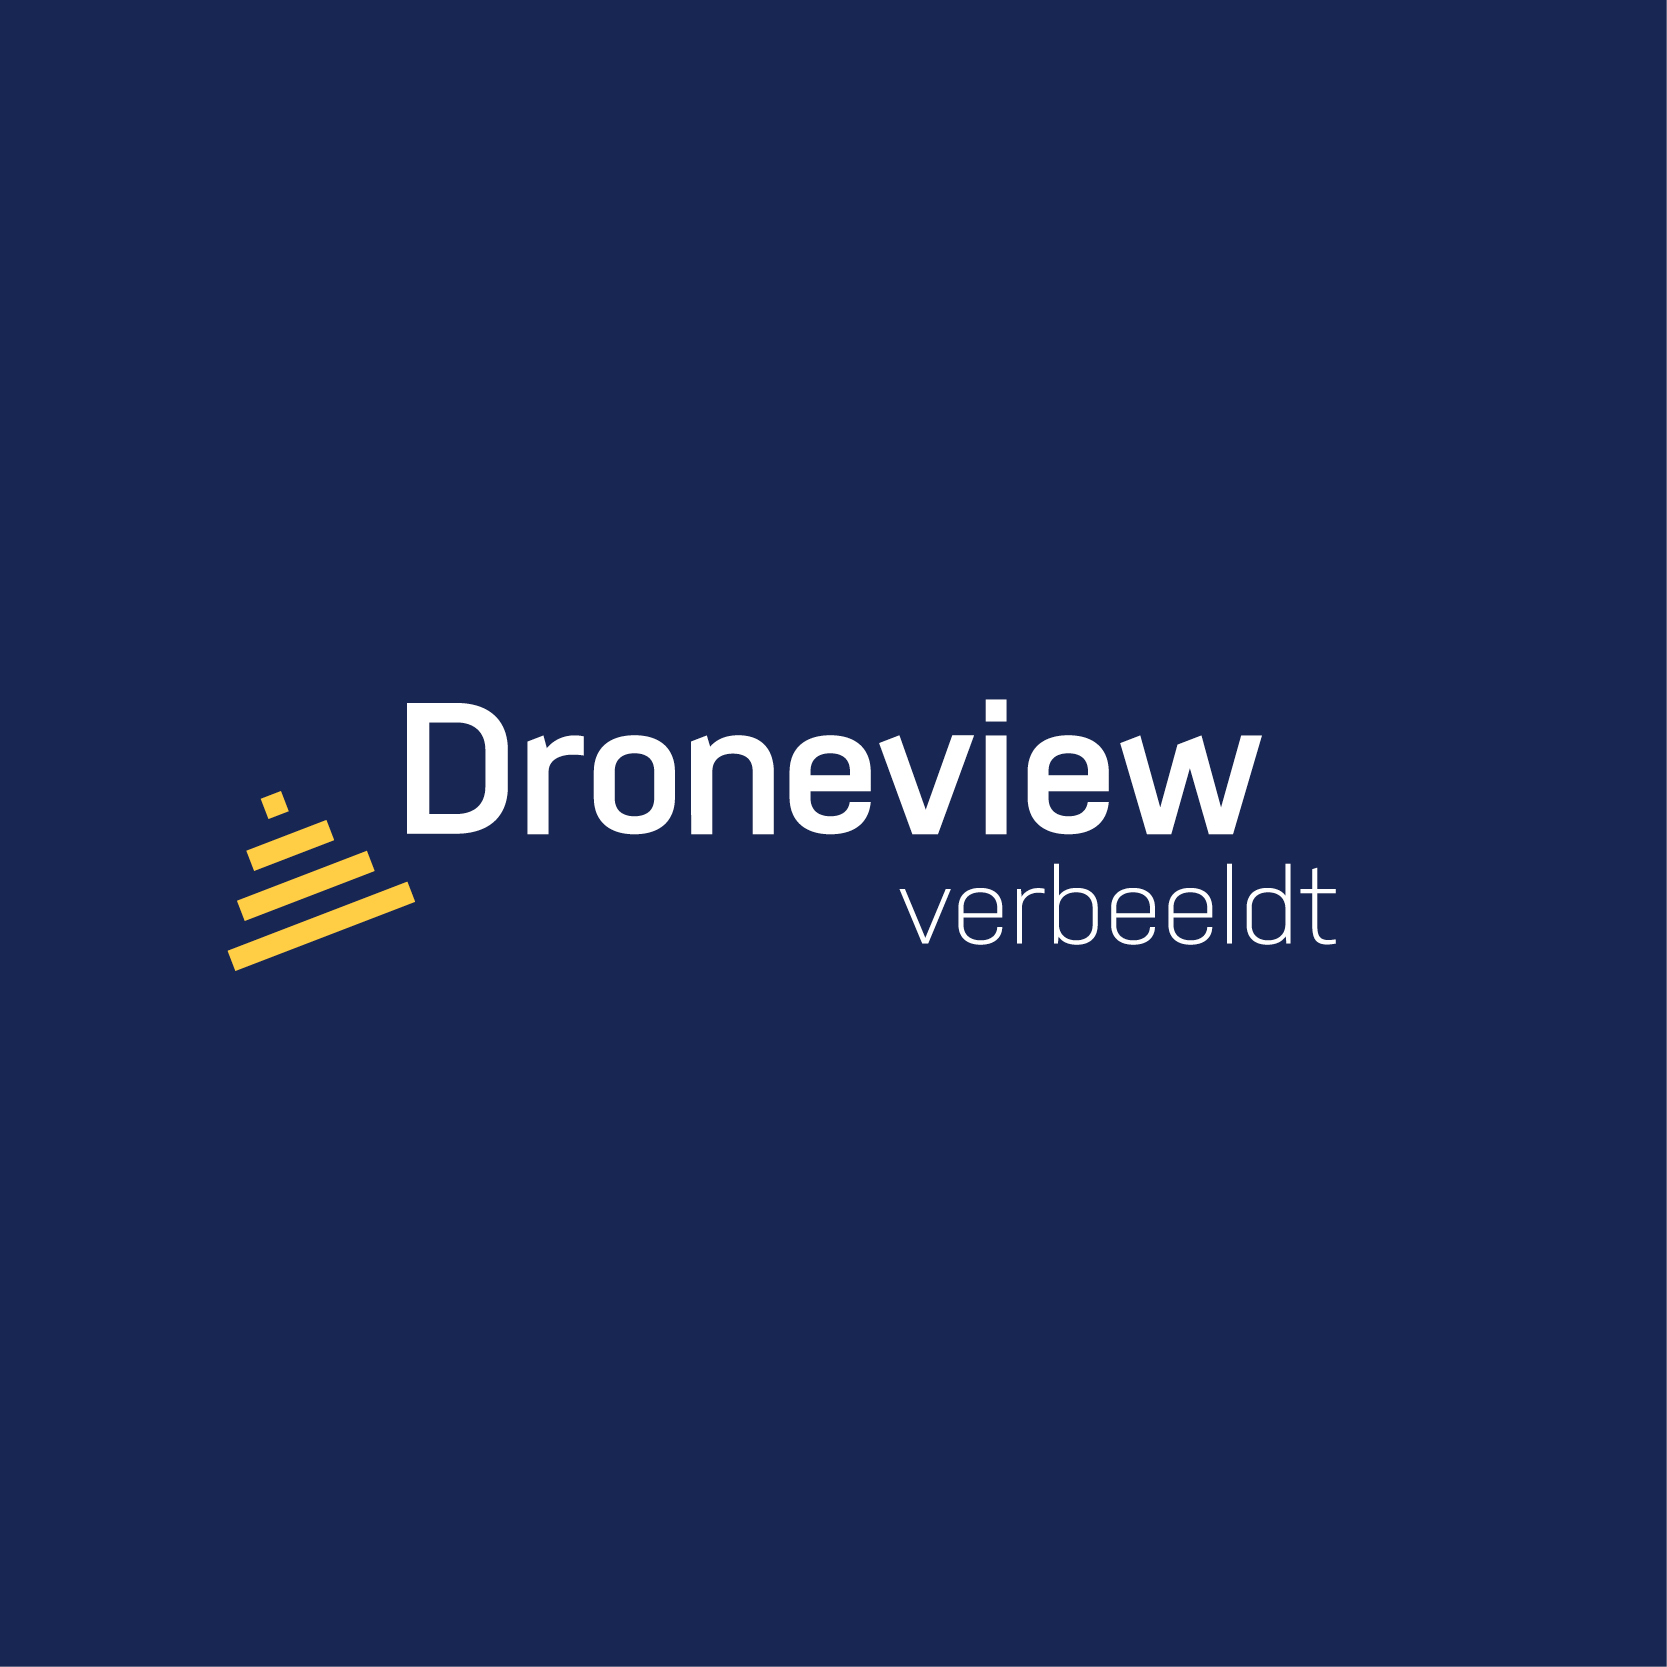 Sjoukjevandervelde_ontwerp logo en huisstijl Droneview